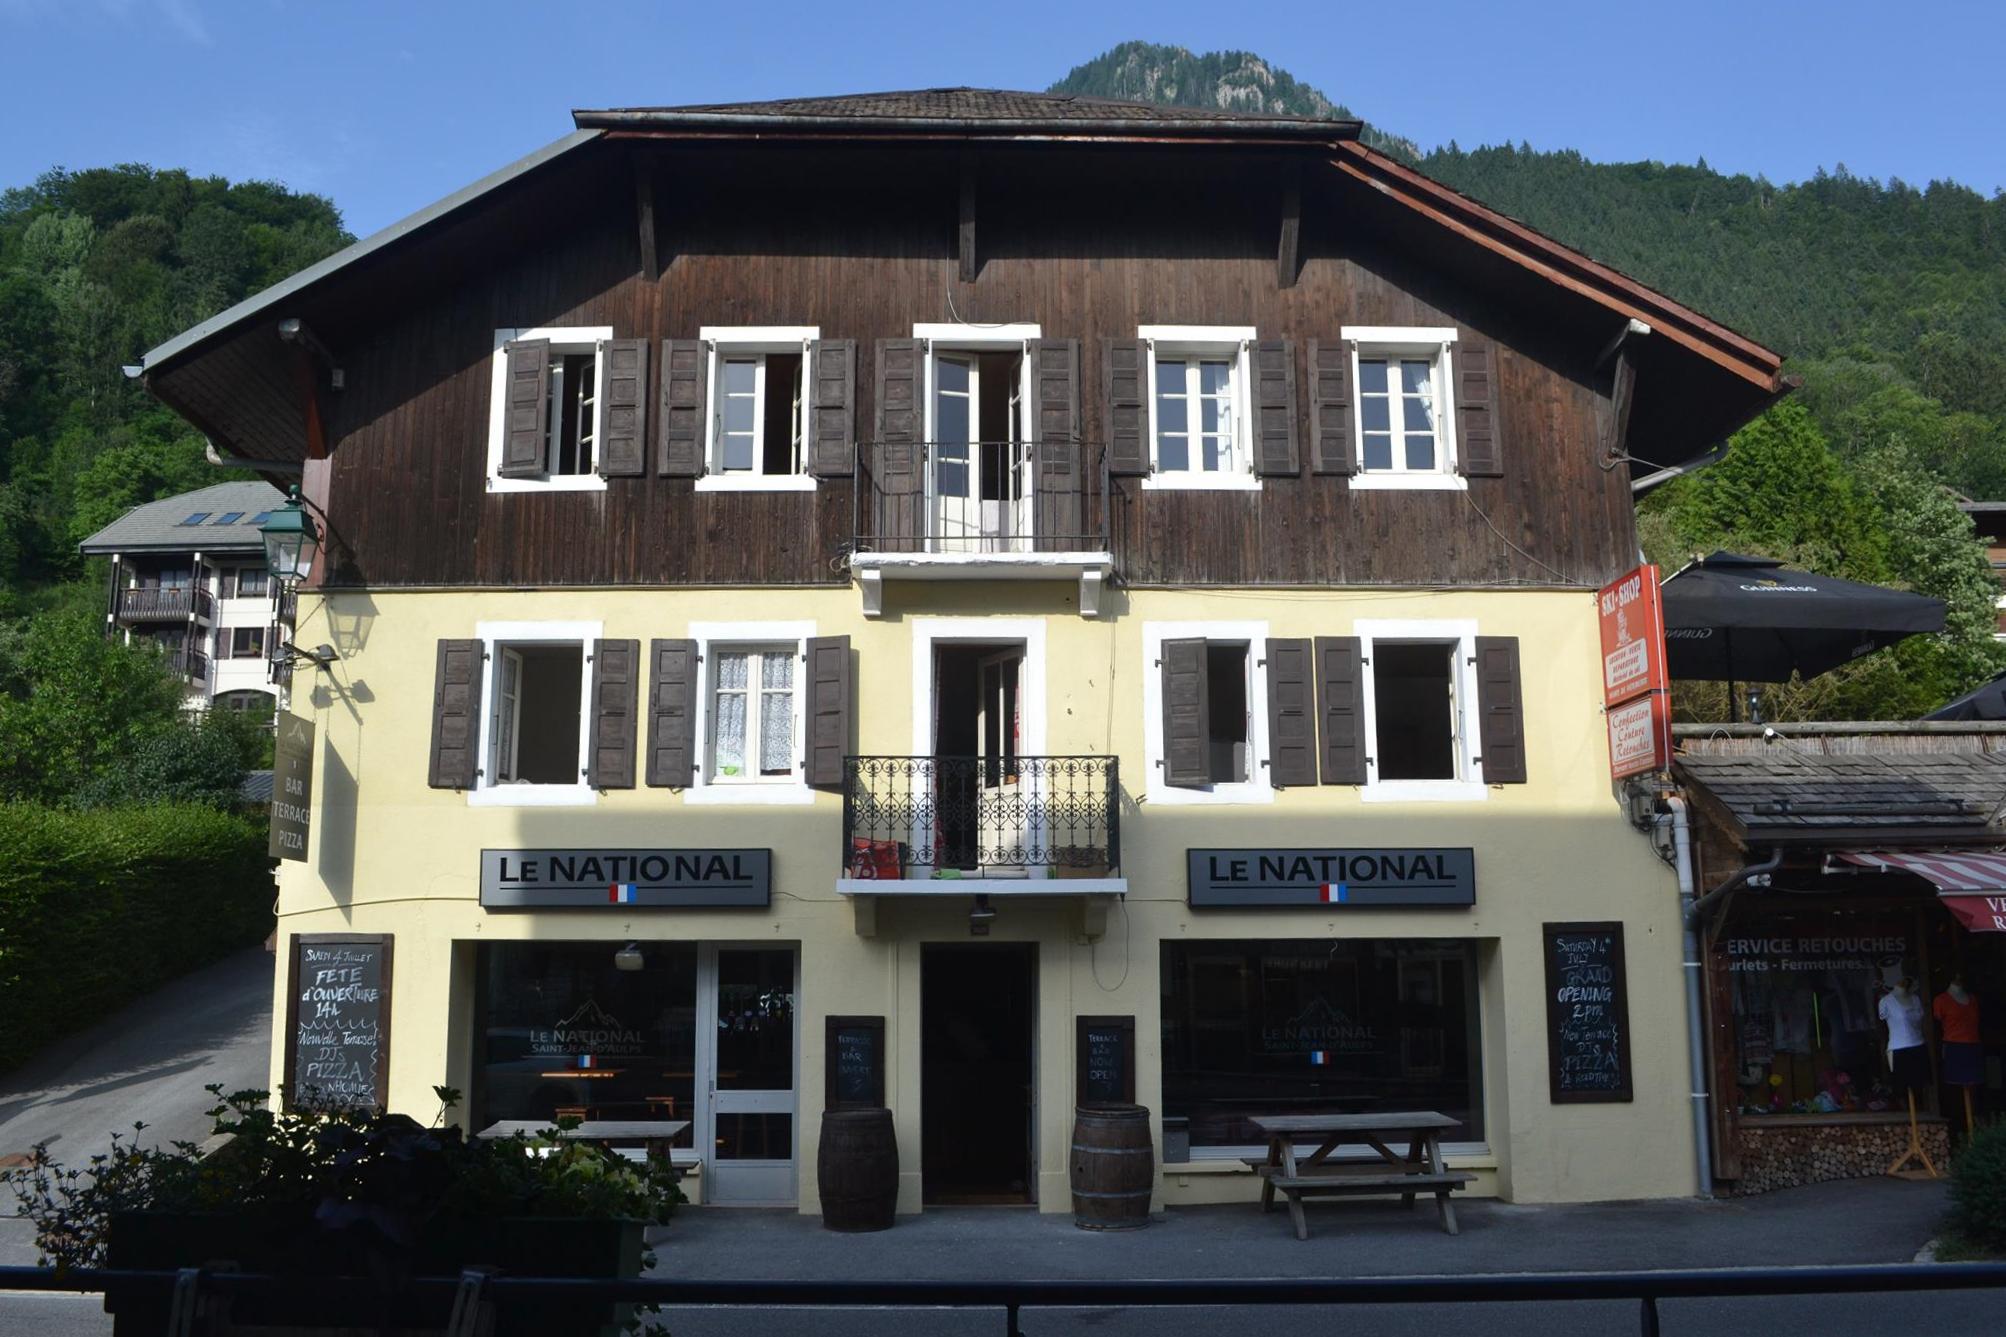 Bar Le National - St Jean d'Aulps, France